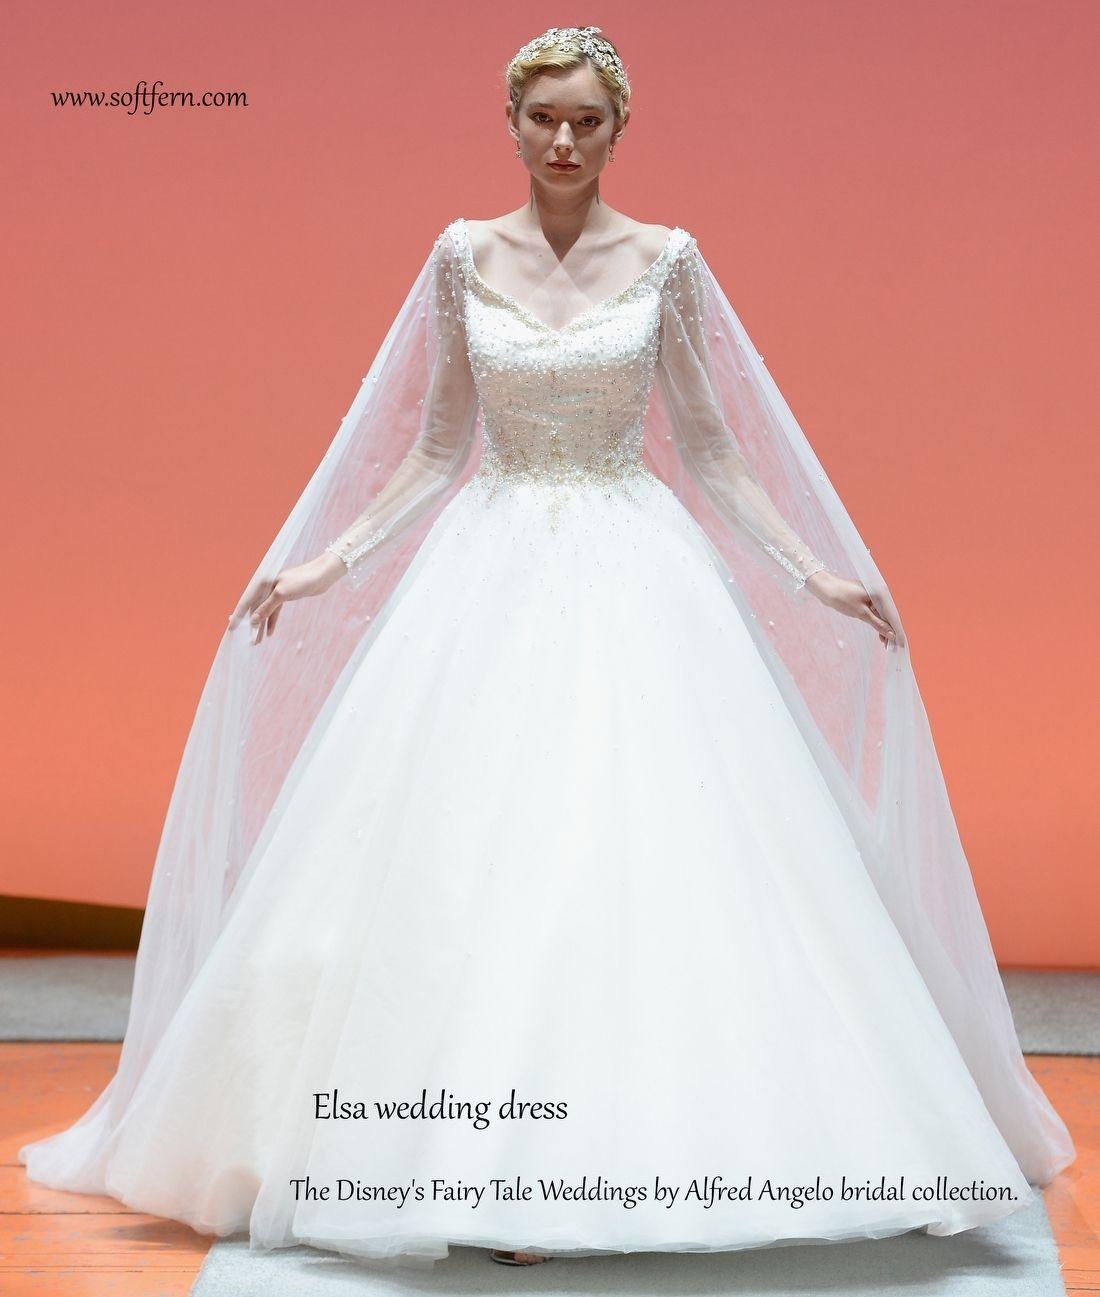 Elsa Wedding Dress The Disney S Fairy Tale Weddings By Alfred Angelo Bridal Collection Disney Wedding Dresses Elsa Wedding Dress Disney Princess Wedding [ 1297 x 1100 Pixel ]